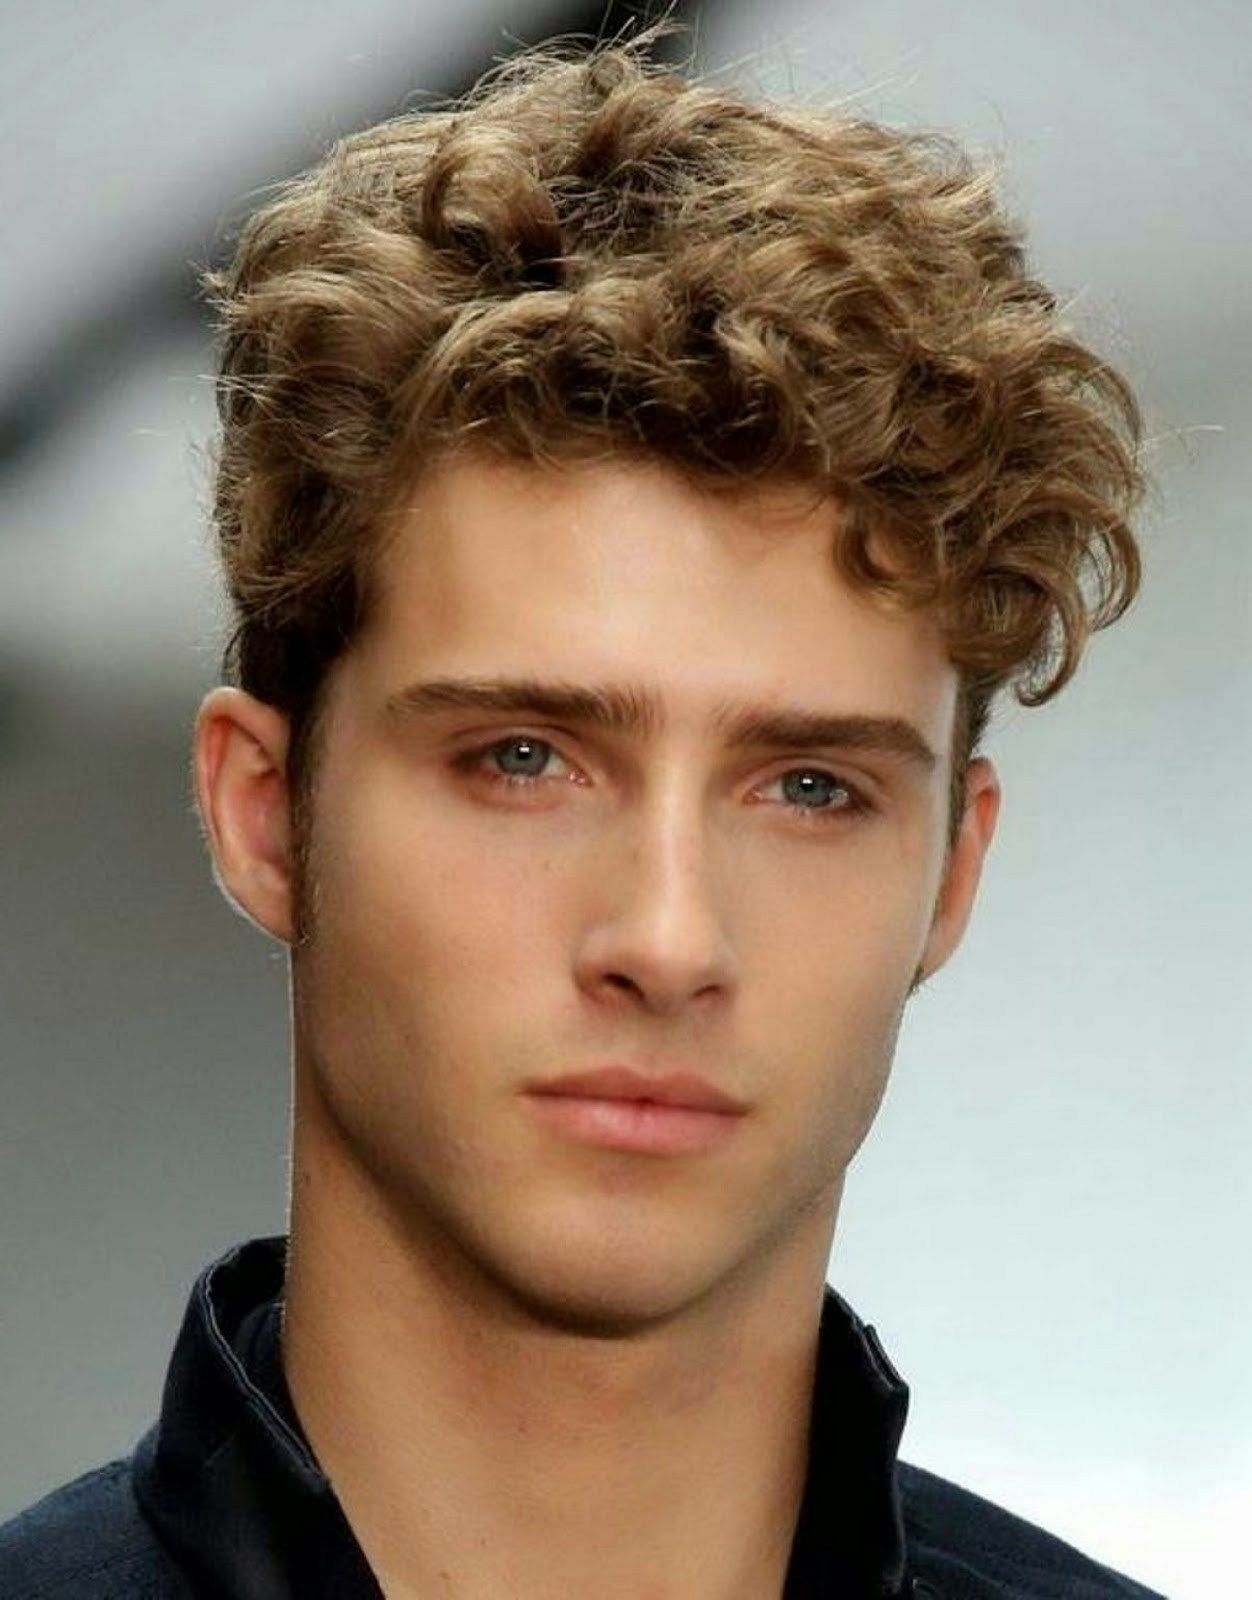 Schöne Teen Frisuren Jungs Neue Haare Frisuren Pinterest Hair